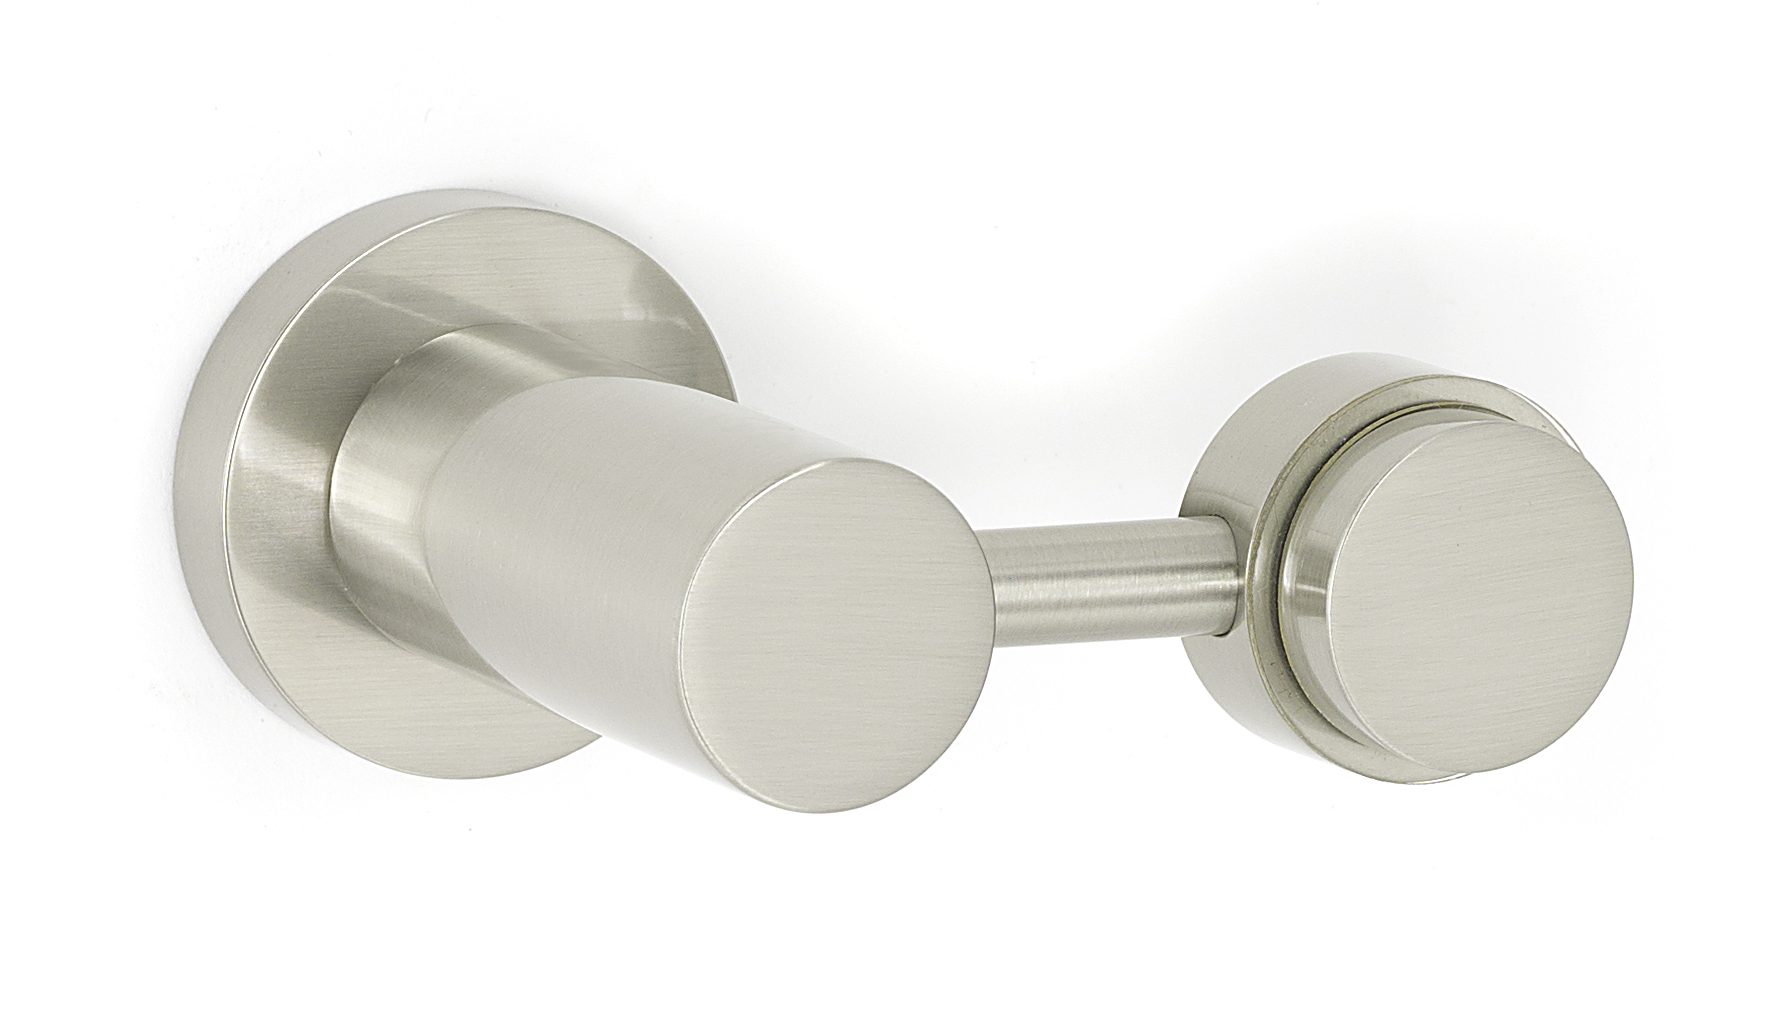 Bathroom Mirror Brackets contemporary i mirror brackets a8391 (mirrors sold separately